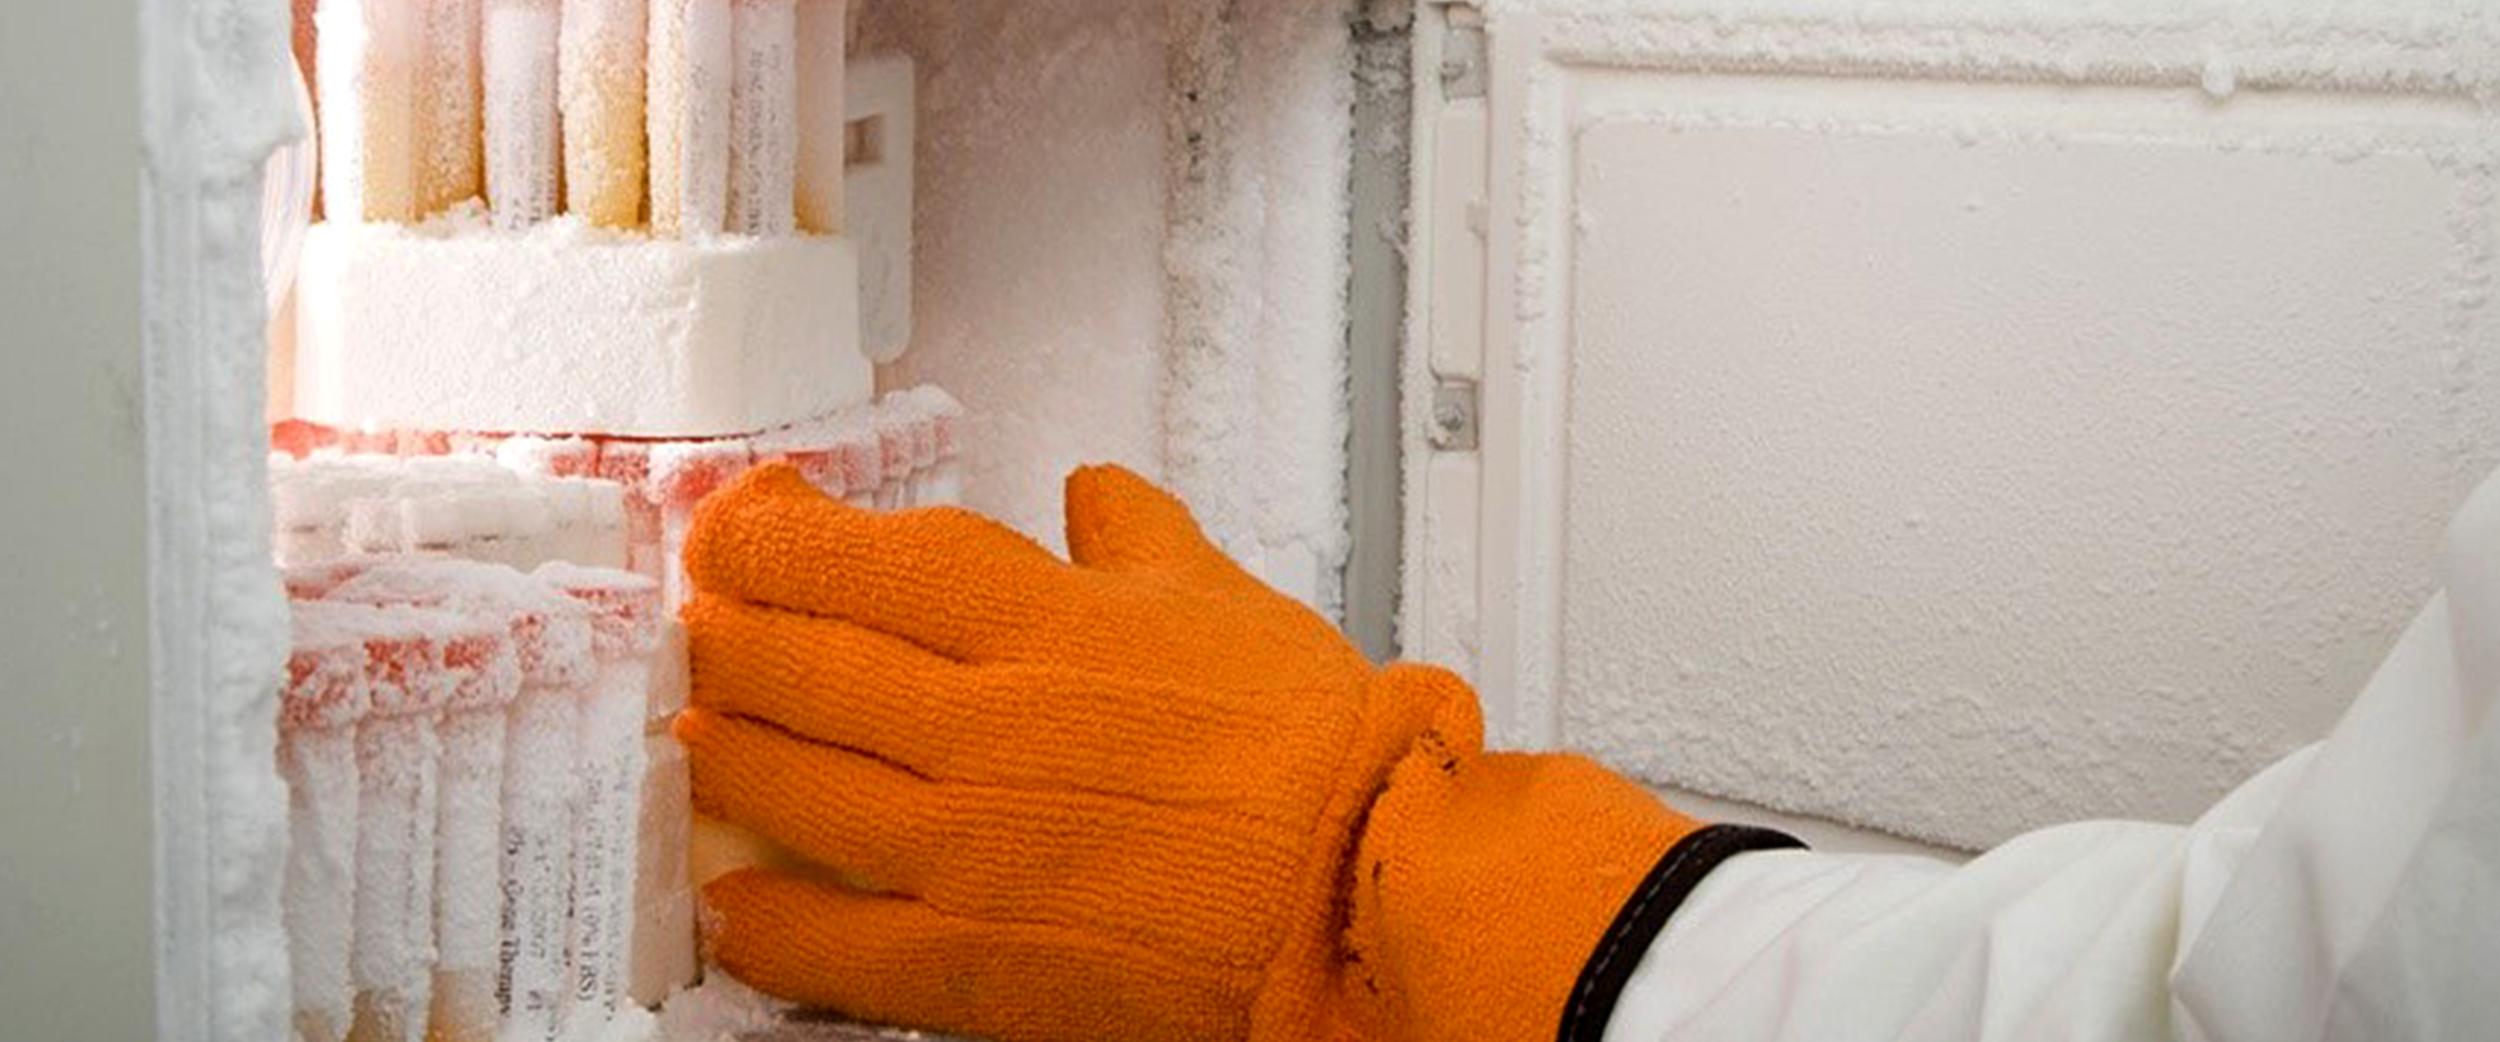 Freezer Inventory Management-1